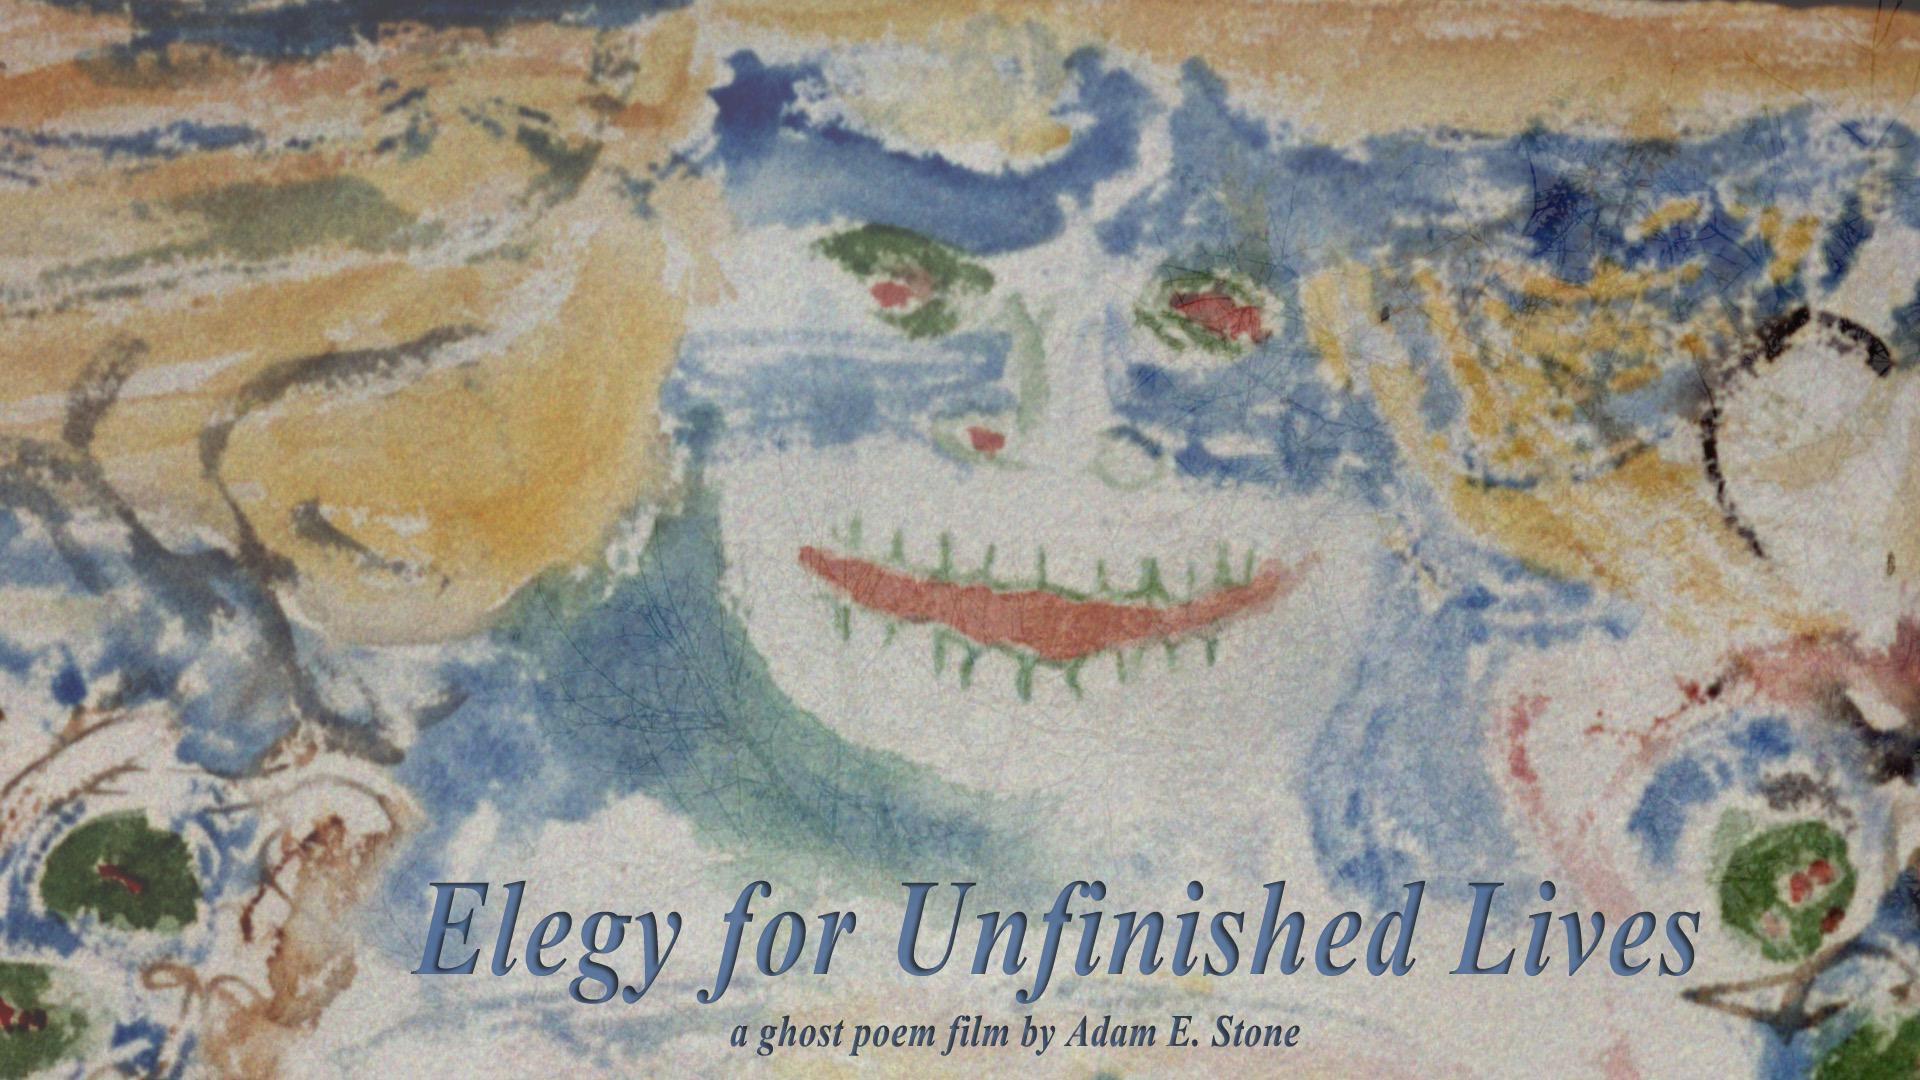 Elegy for Unfinished Lives